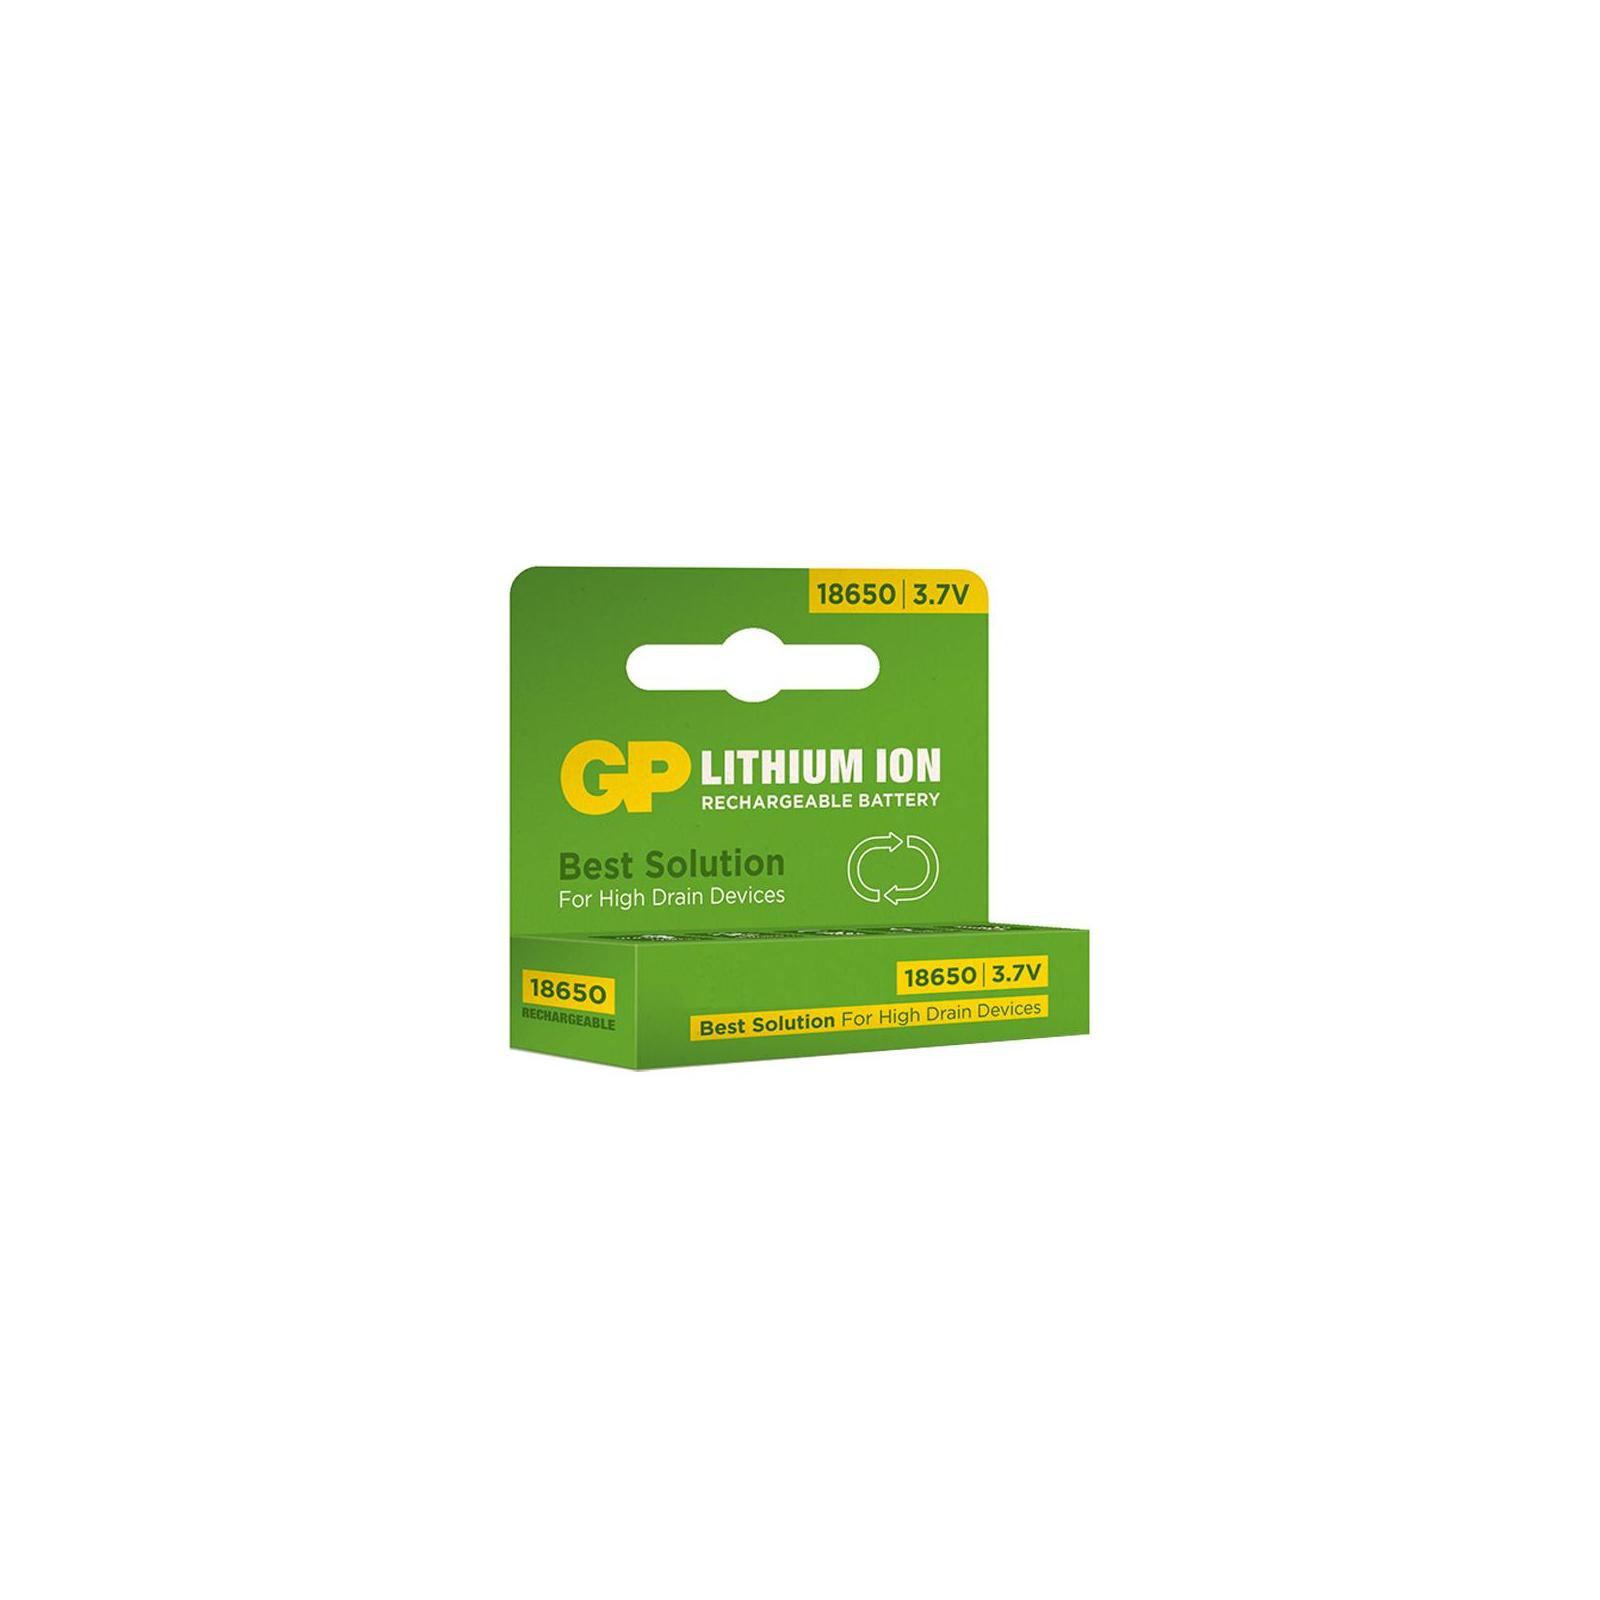 Аккумулятор Gp 18650 2200 mAh (max 6.6А) (GP1865T220) изображение 2